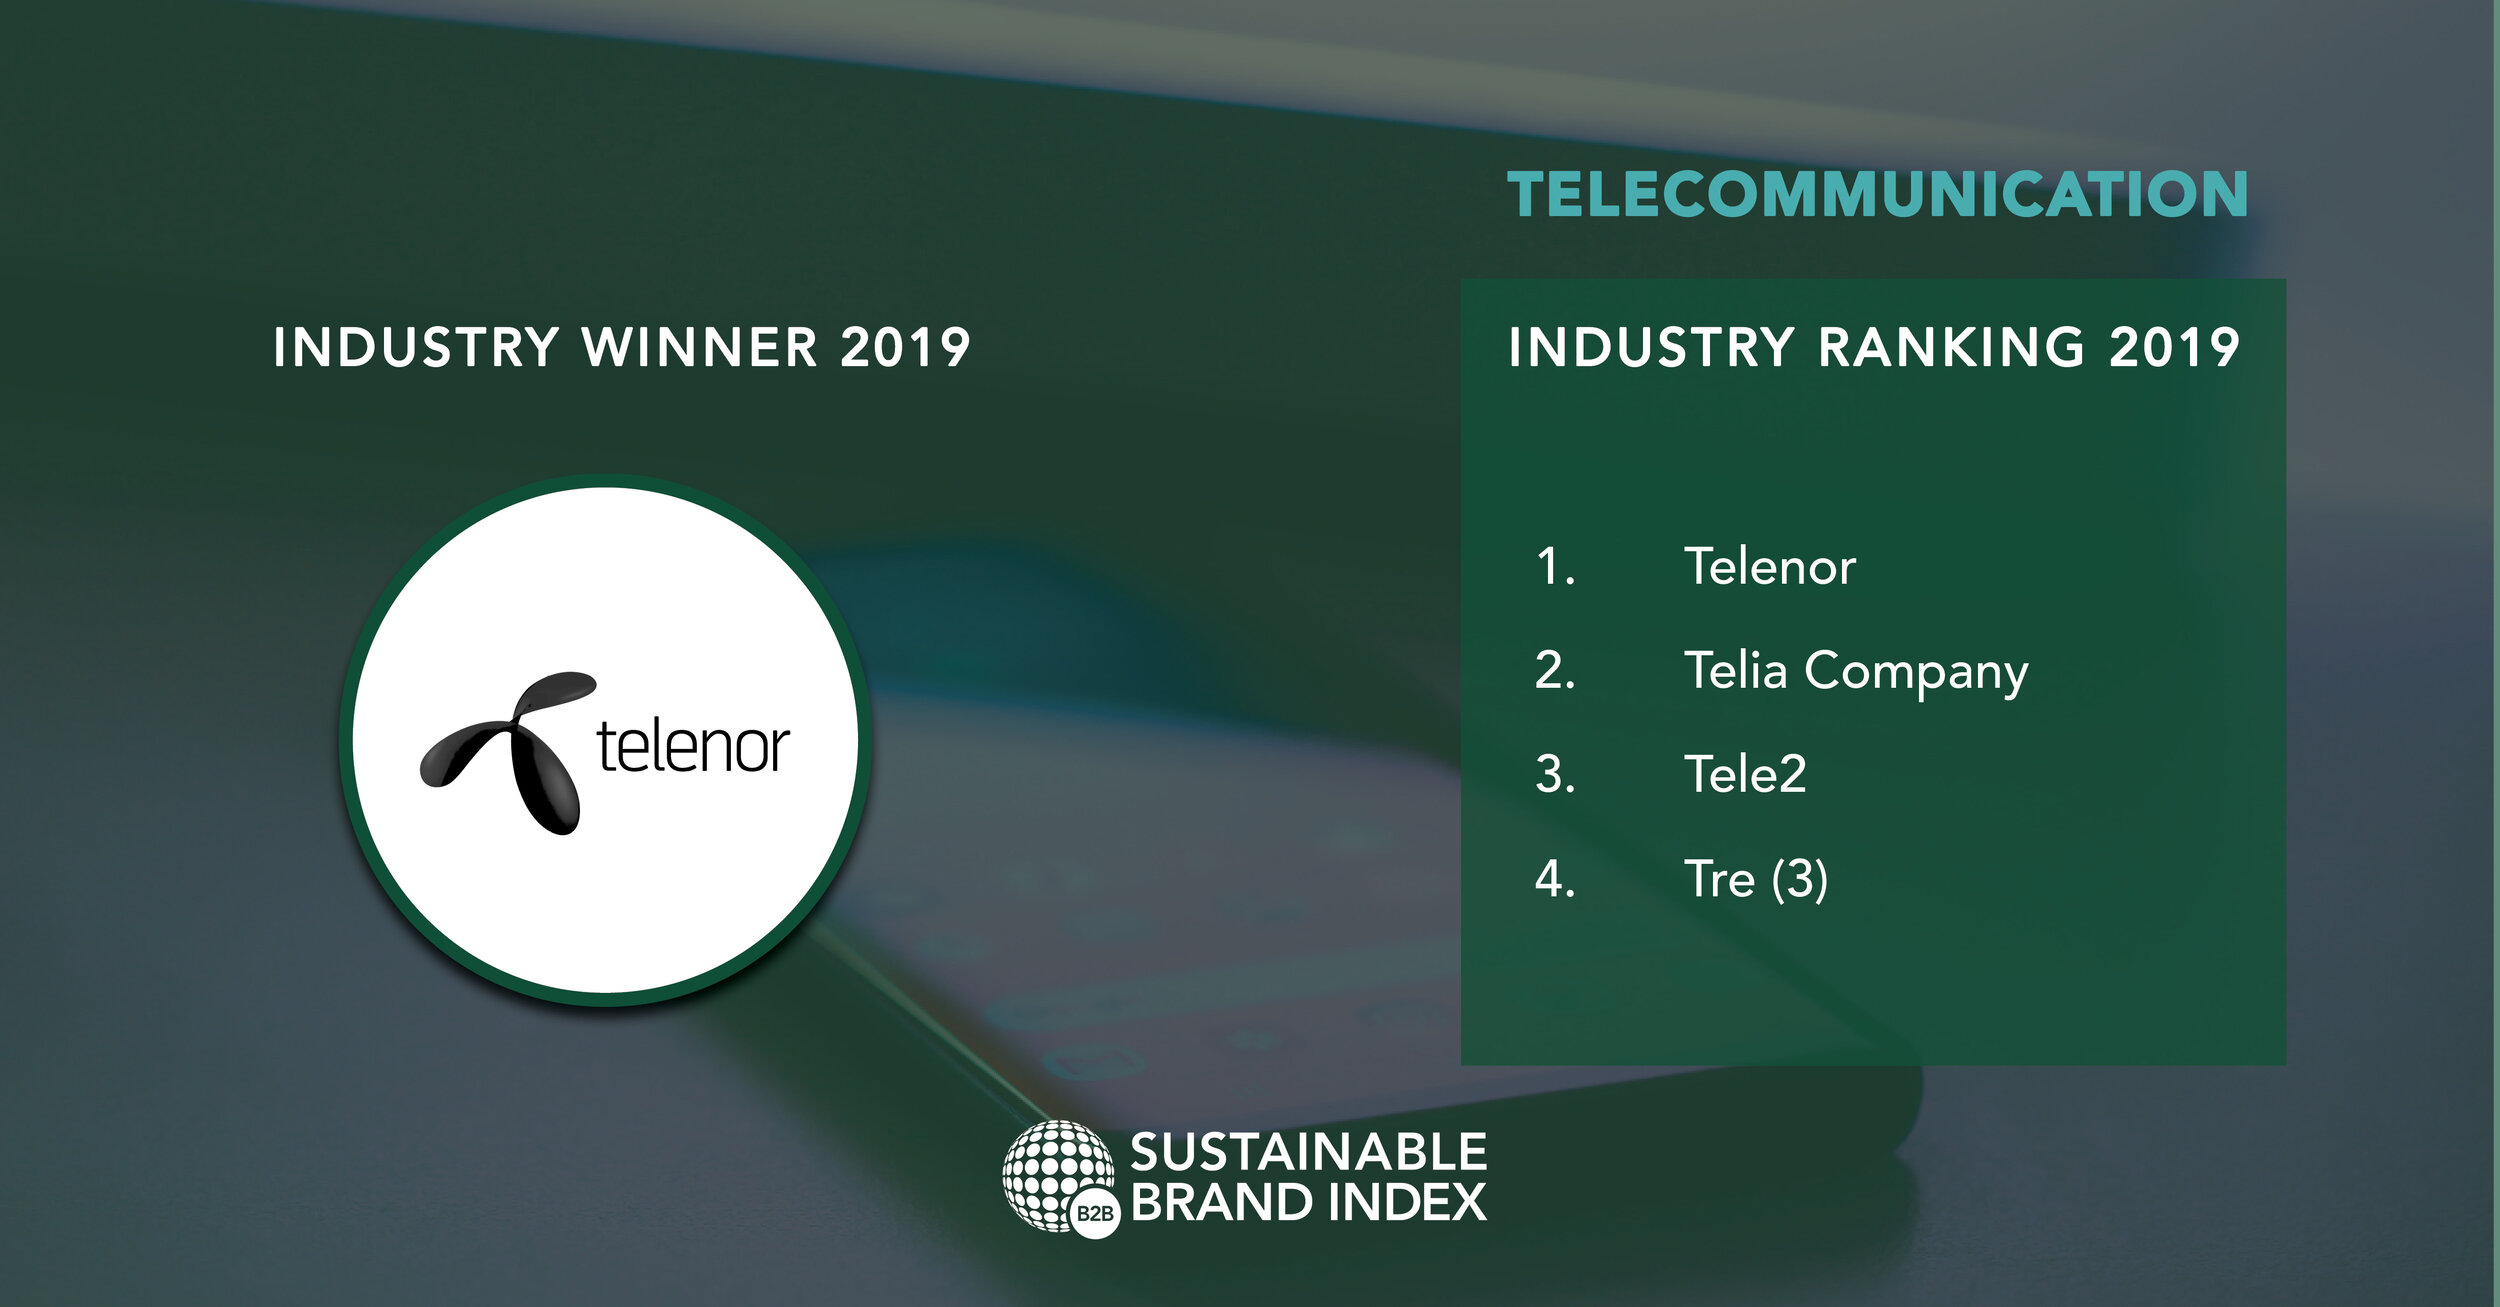 Telecommunication - Industry_Ranking_B2B_2019.jpg